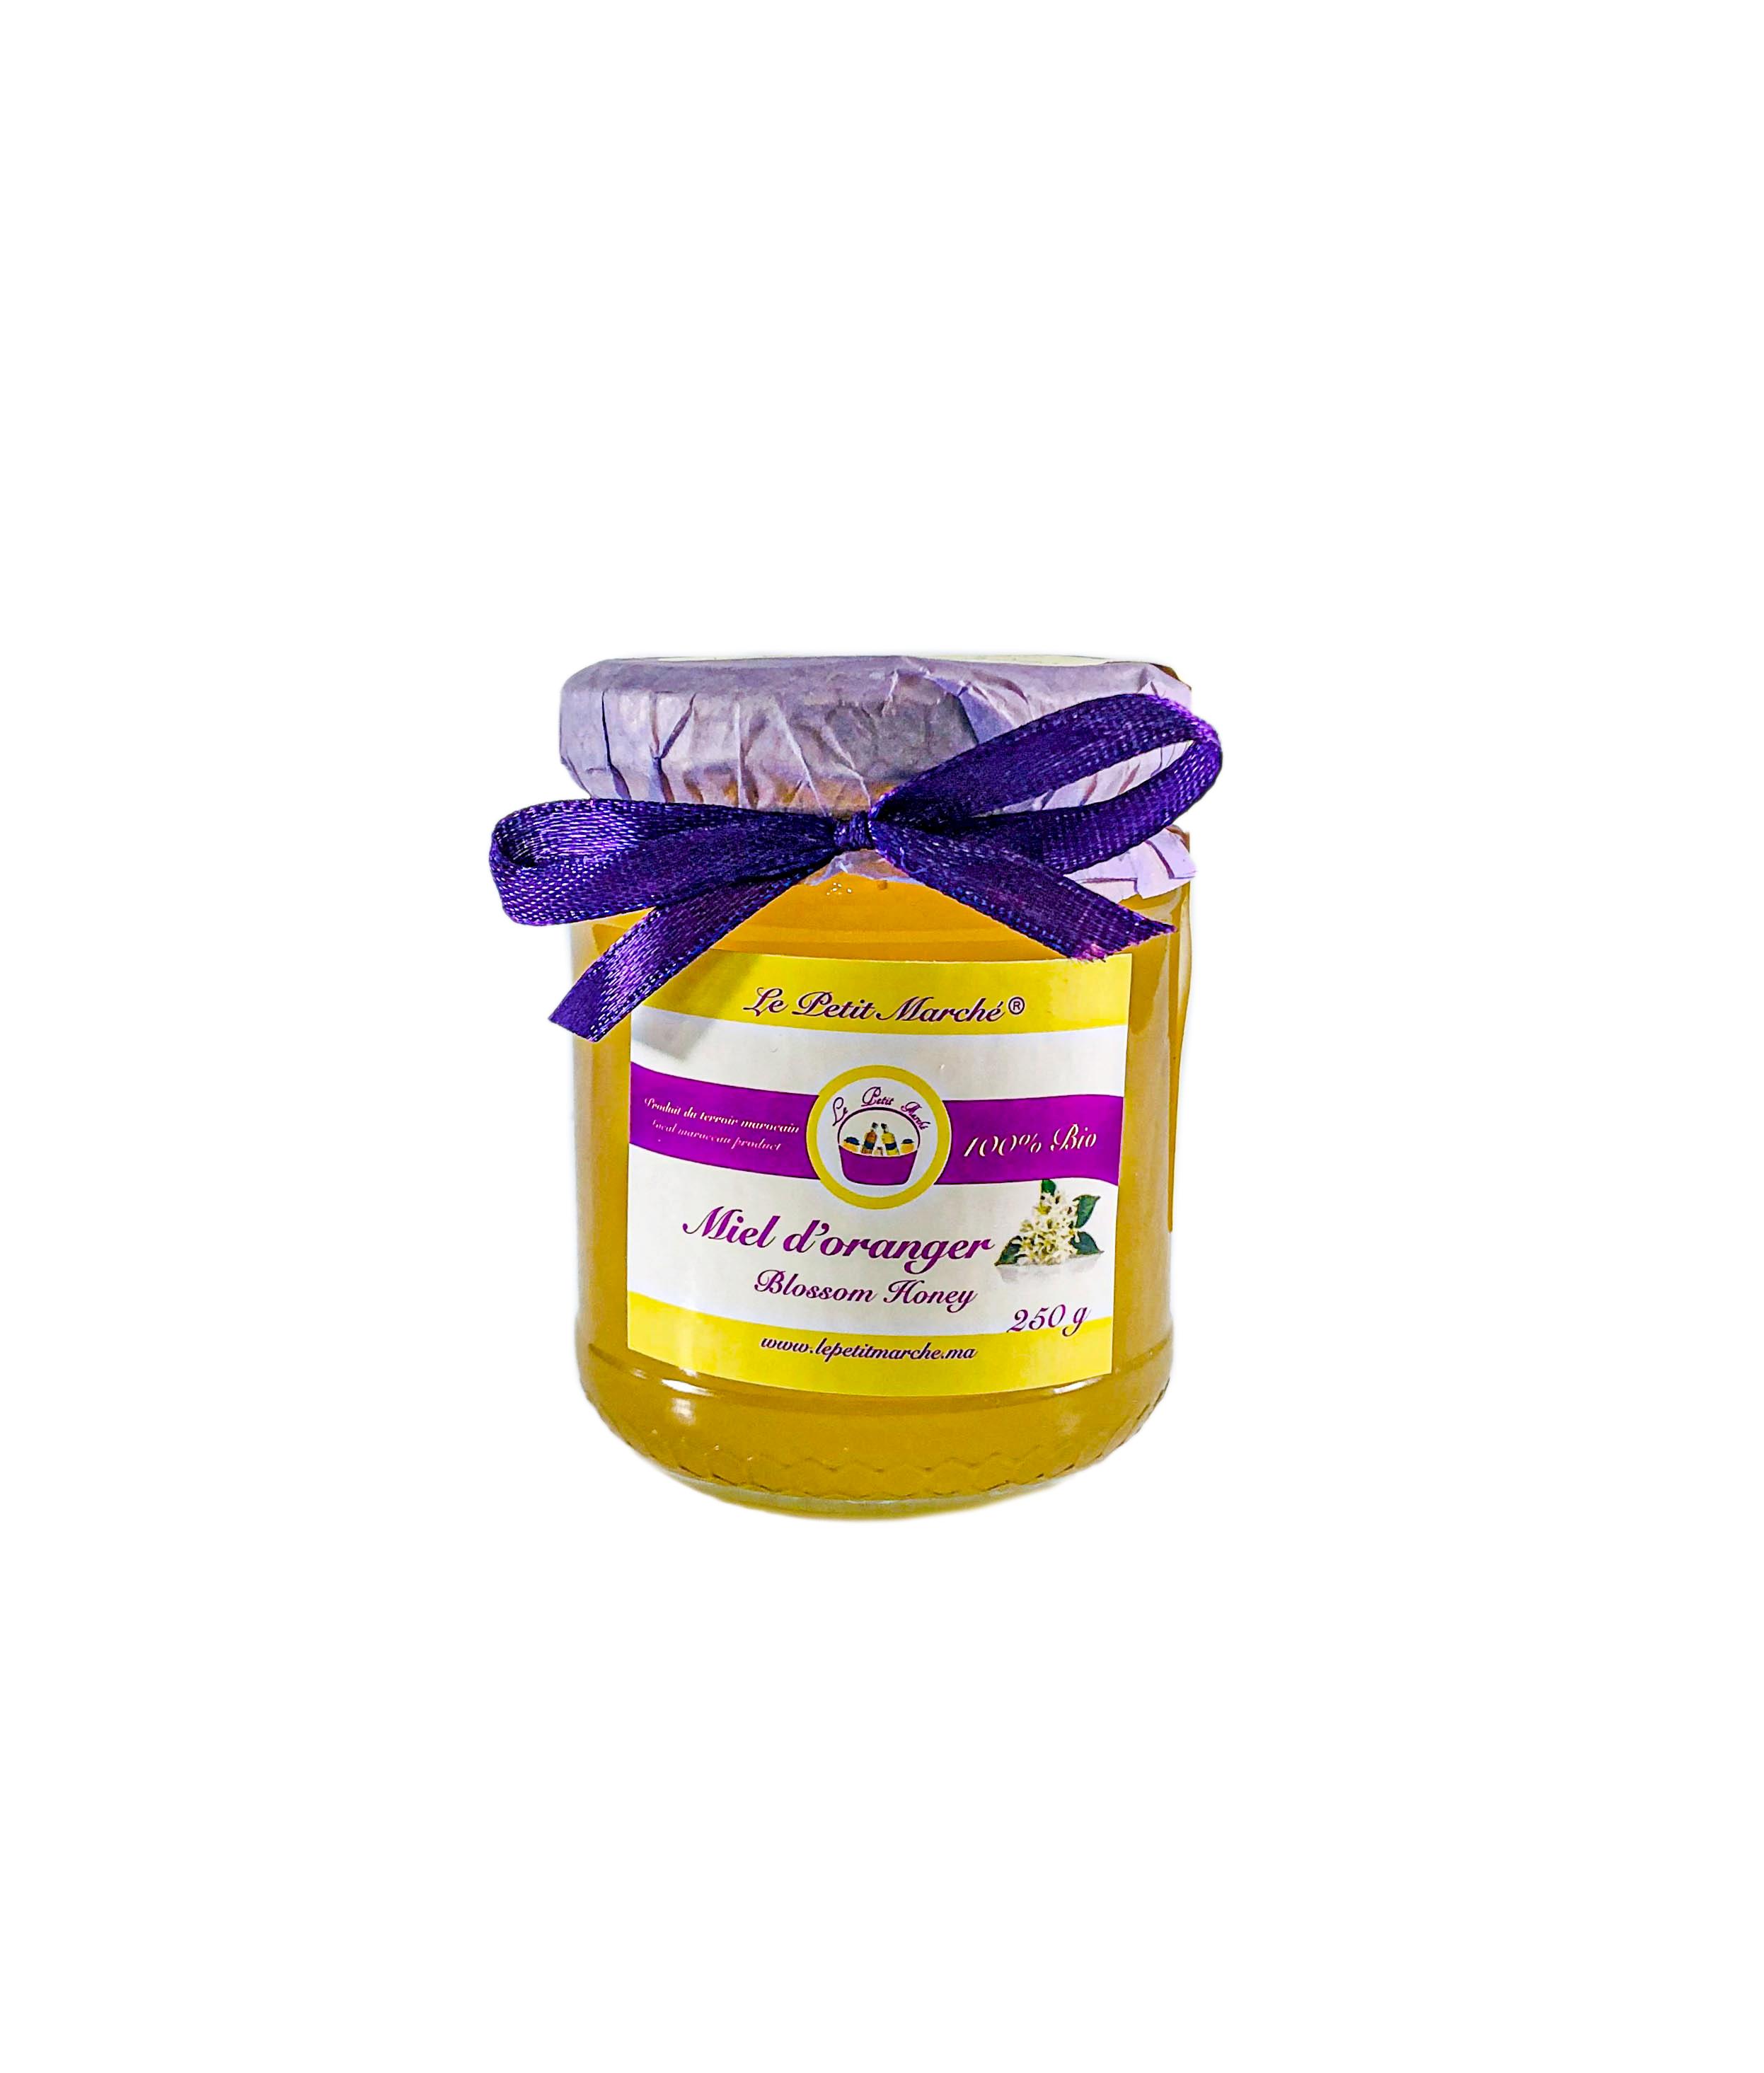 Miel d'oranger 250g